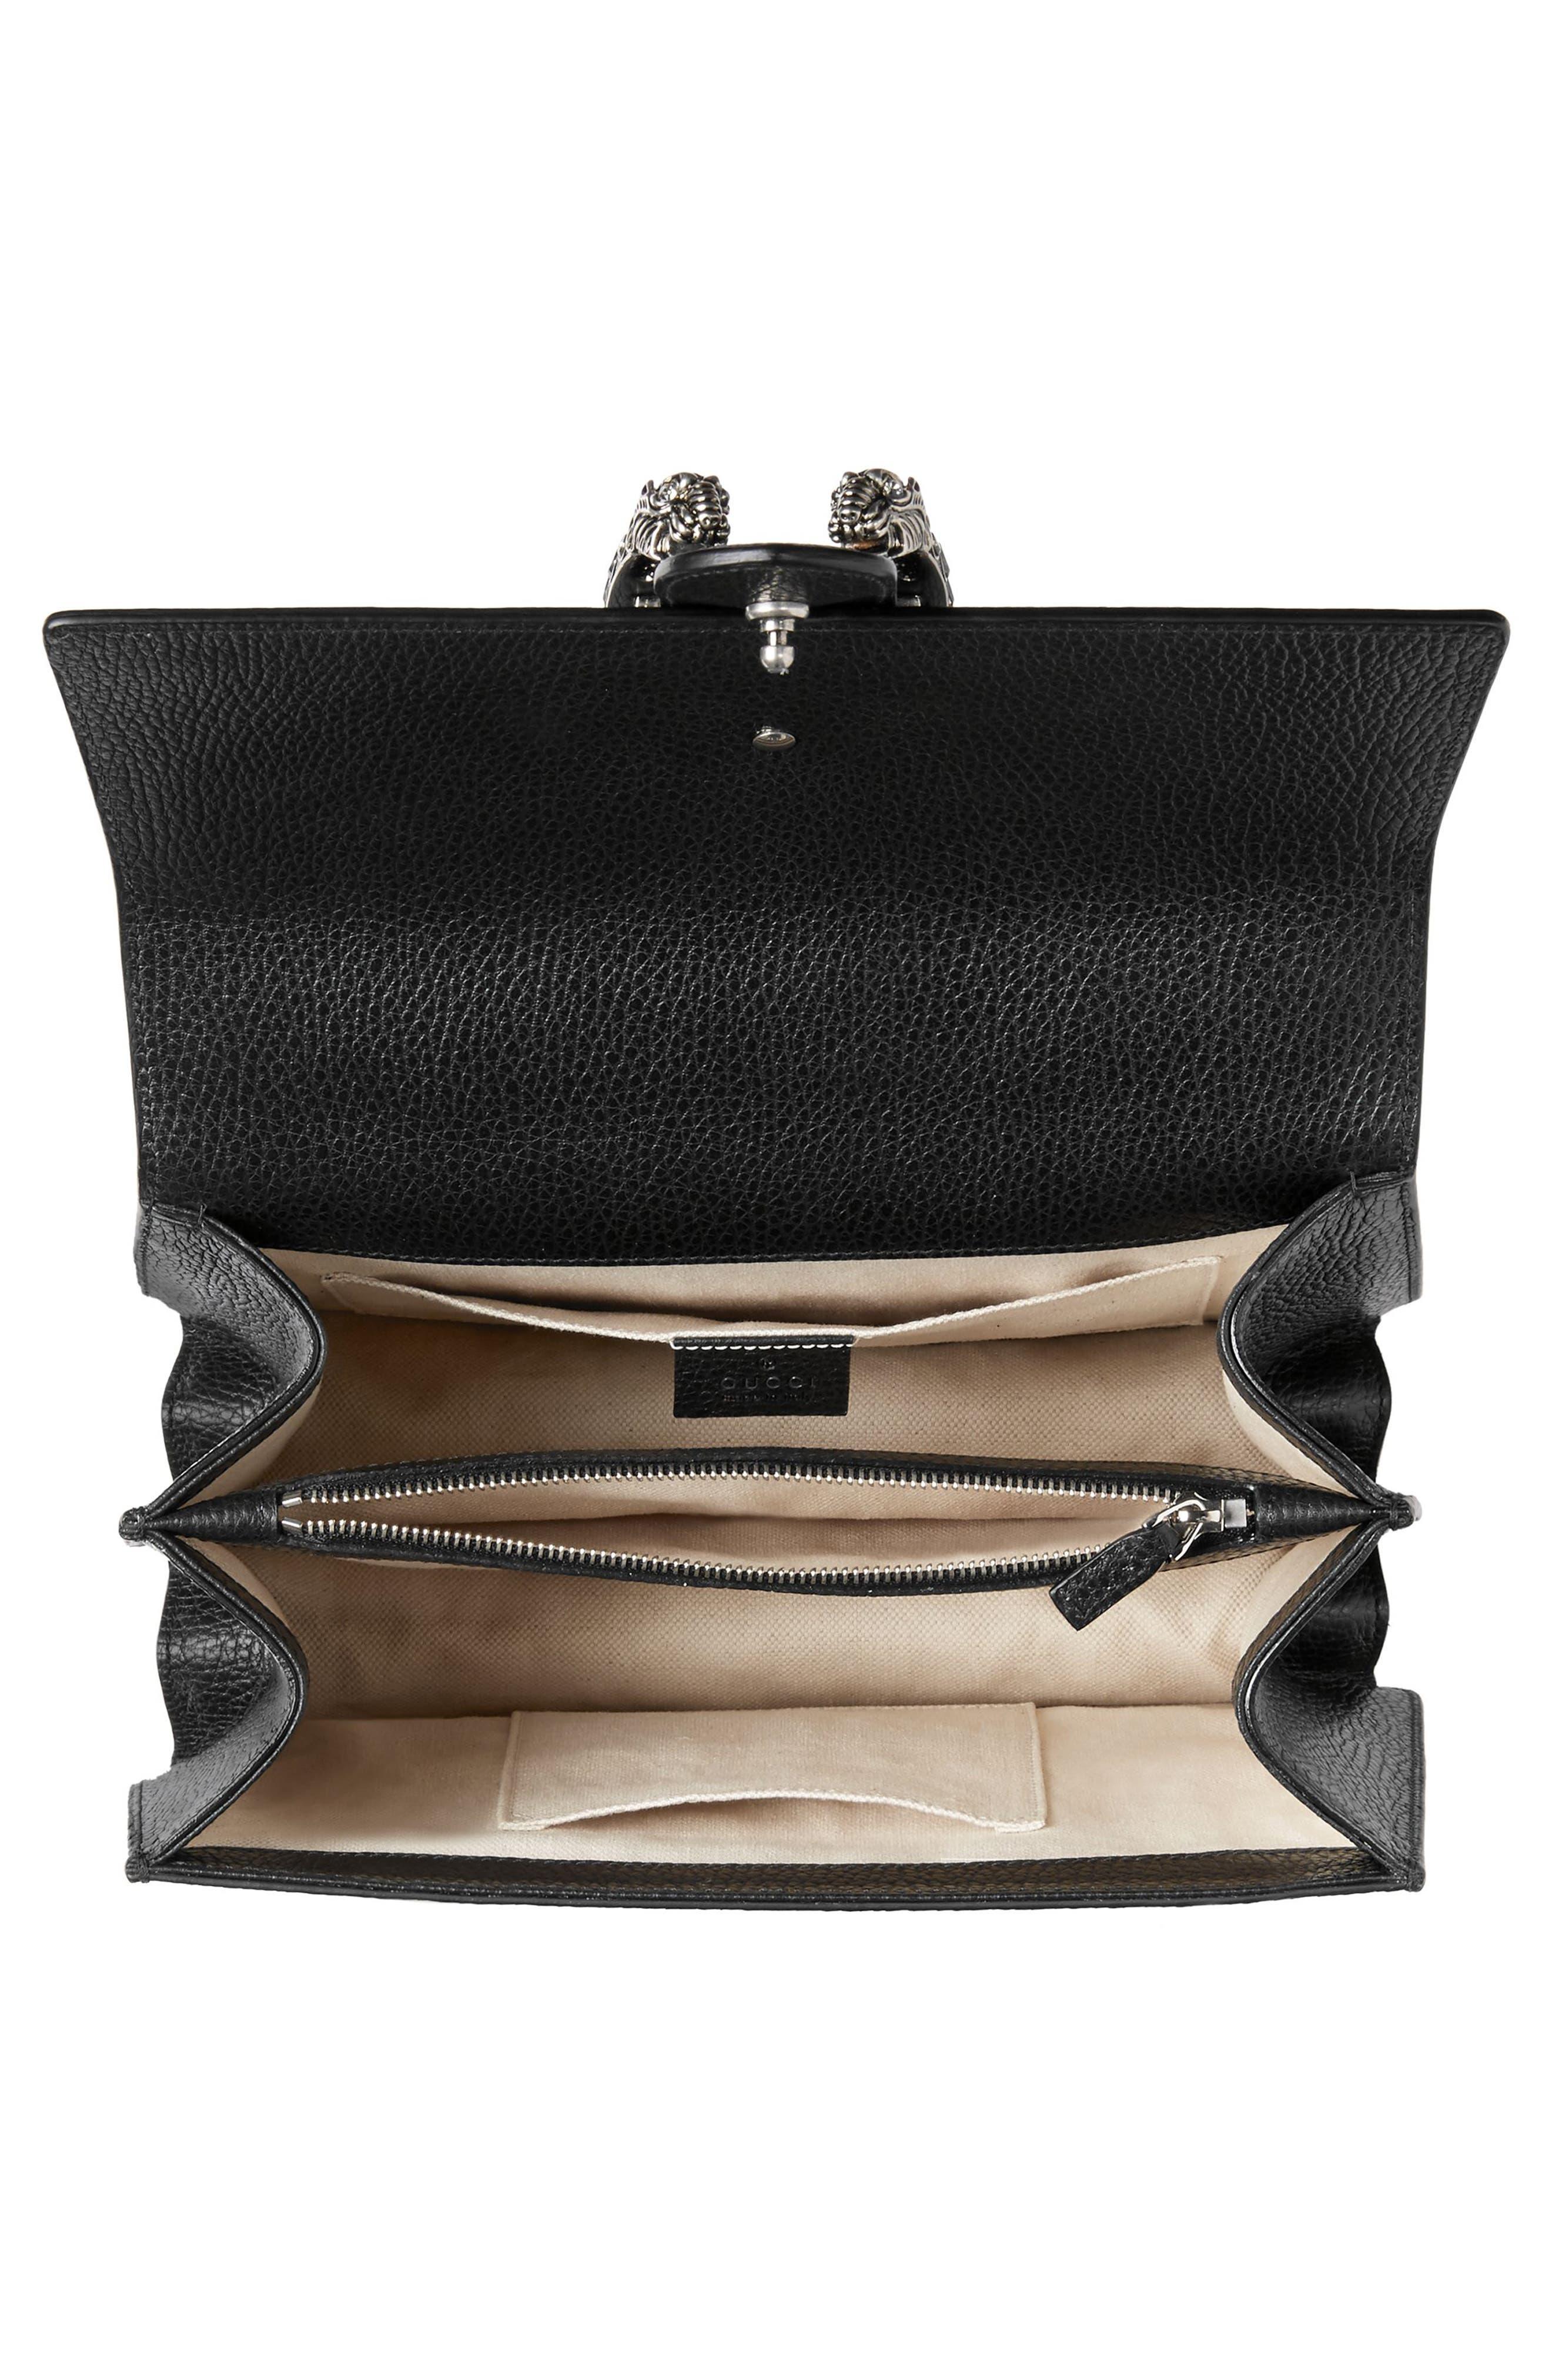 GUCCI, Medium Dionysus Leather Top Handle Satchel, Alternate thumbnail 4, color, NERO/ VRV/ BLACK DIAMOND